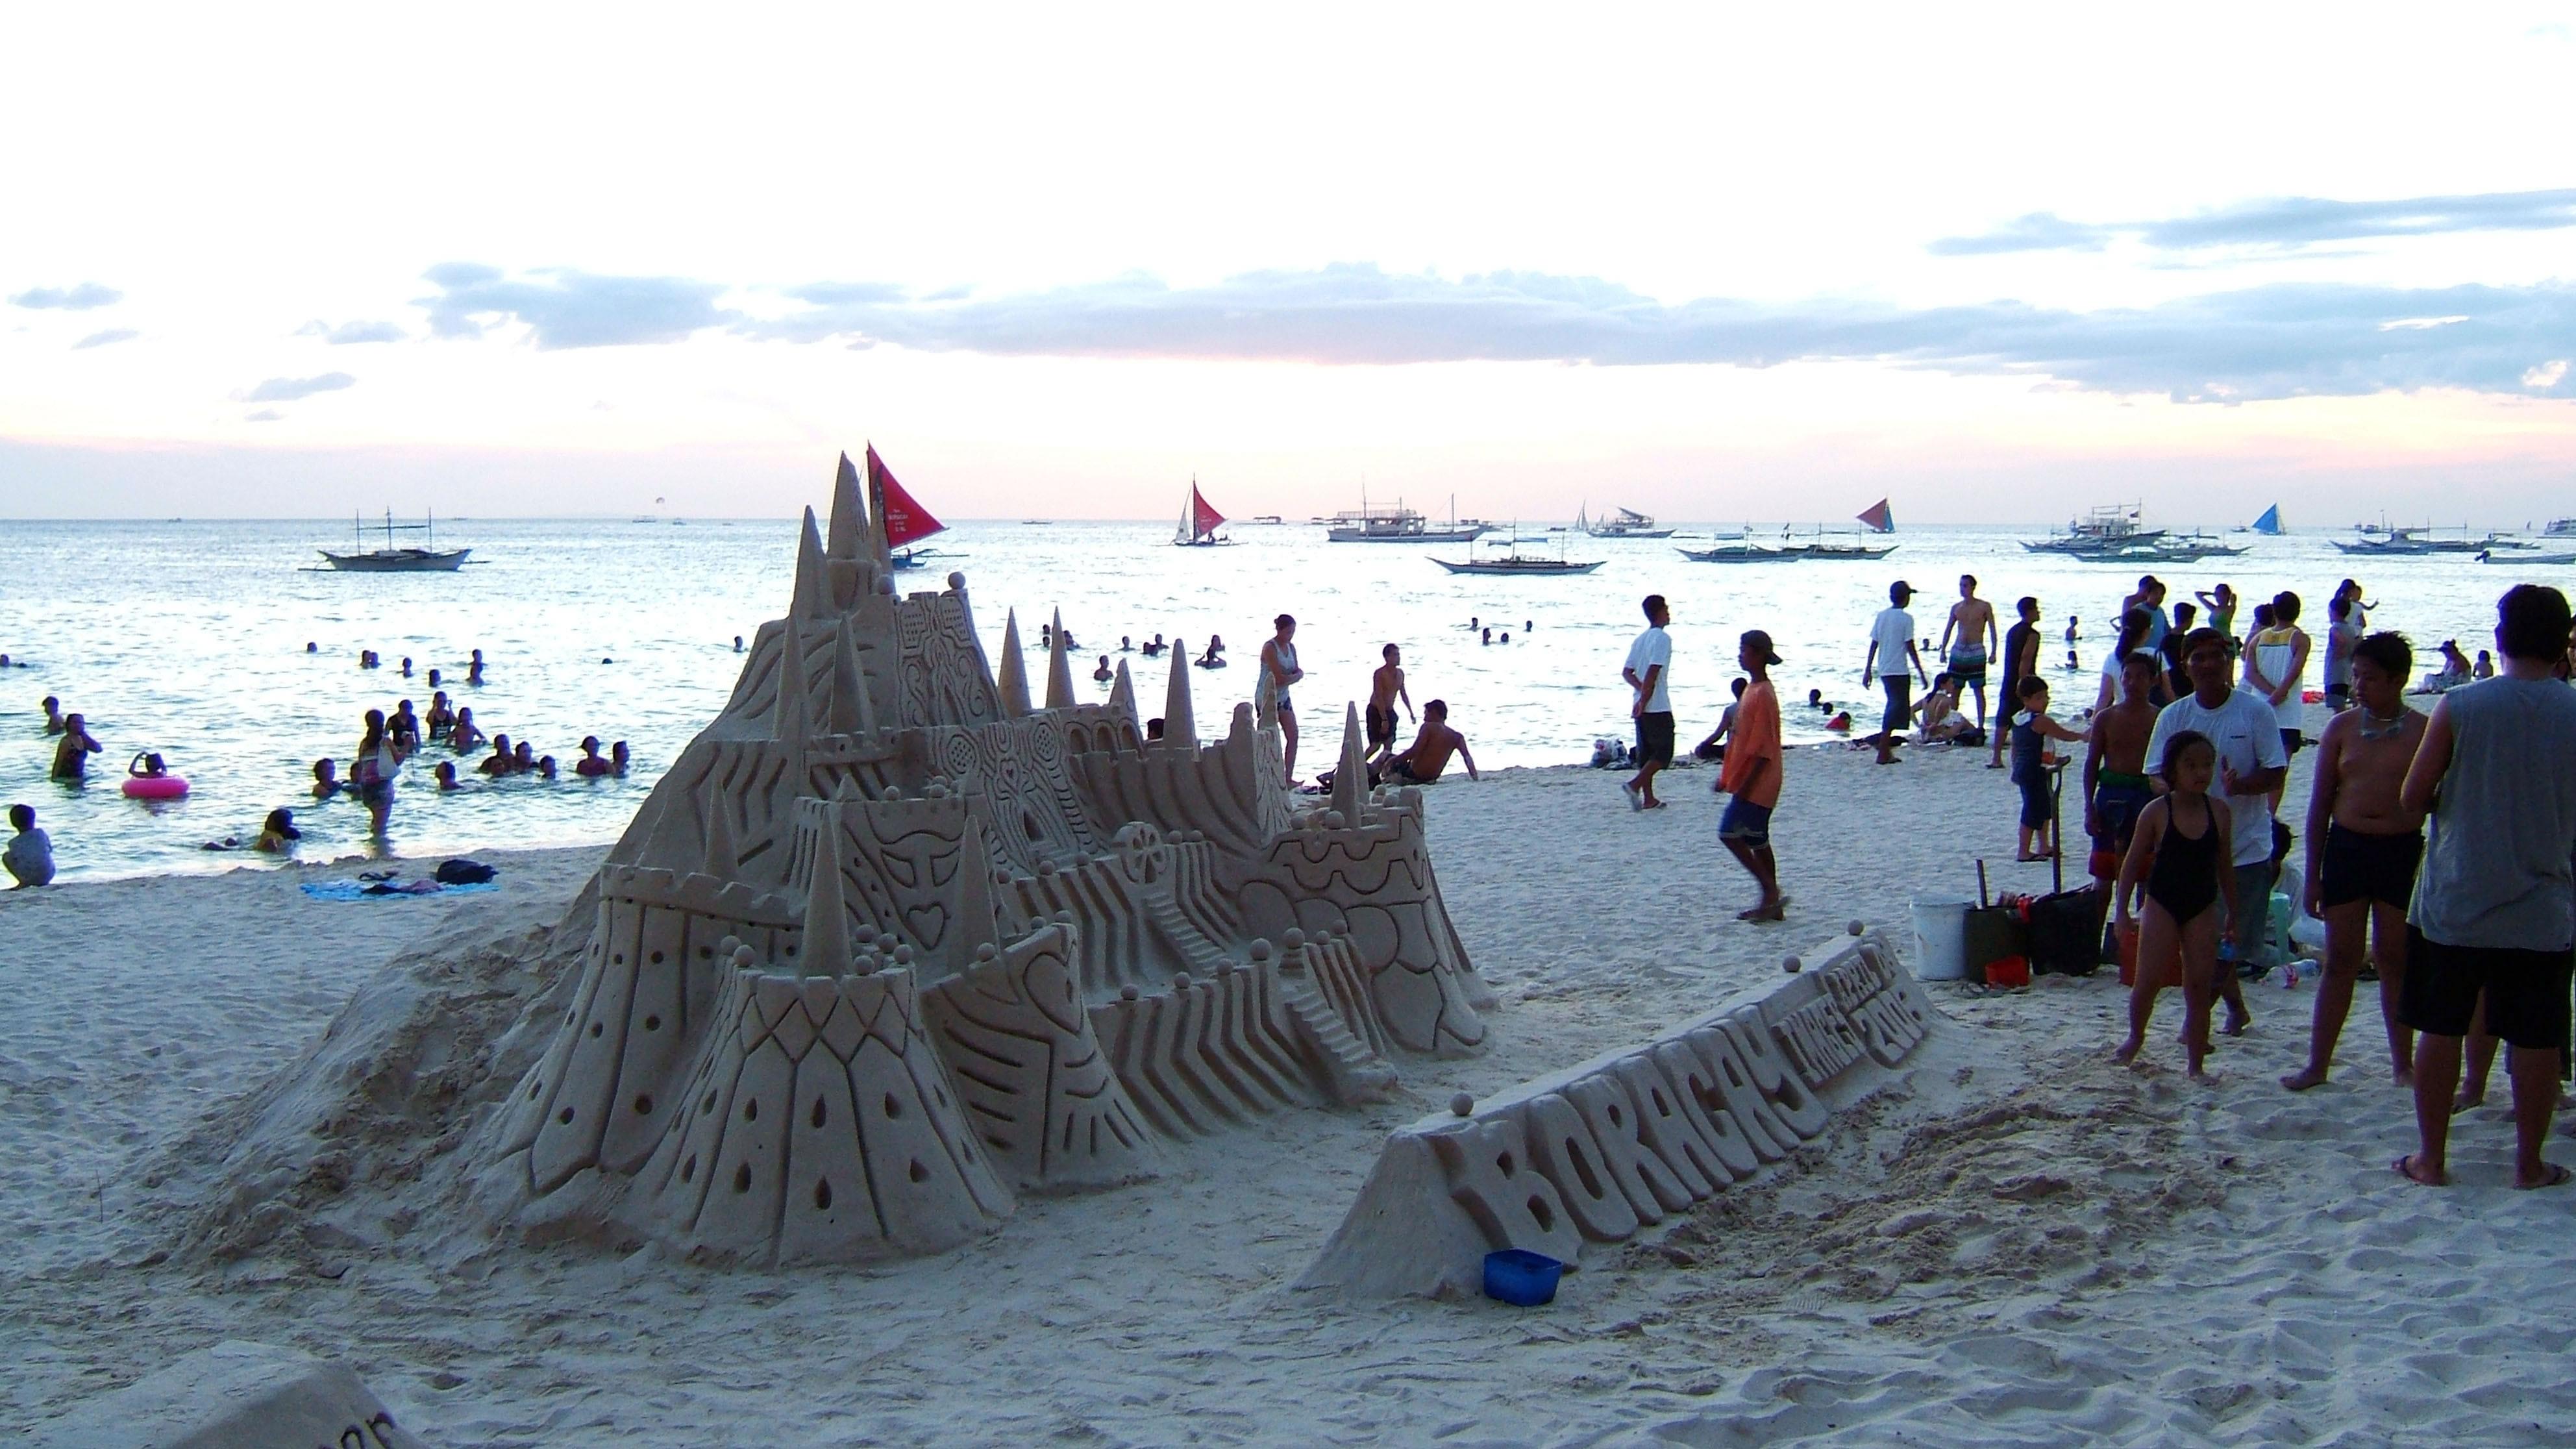 Philippines Sugar Islands Caticlan Boracay White Beach Sand Castles 2006 03